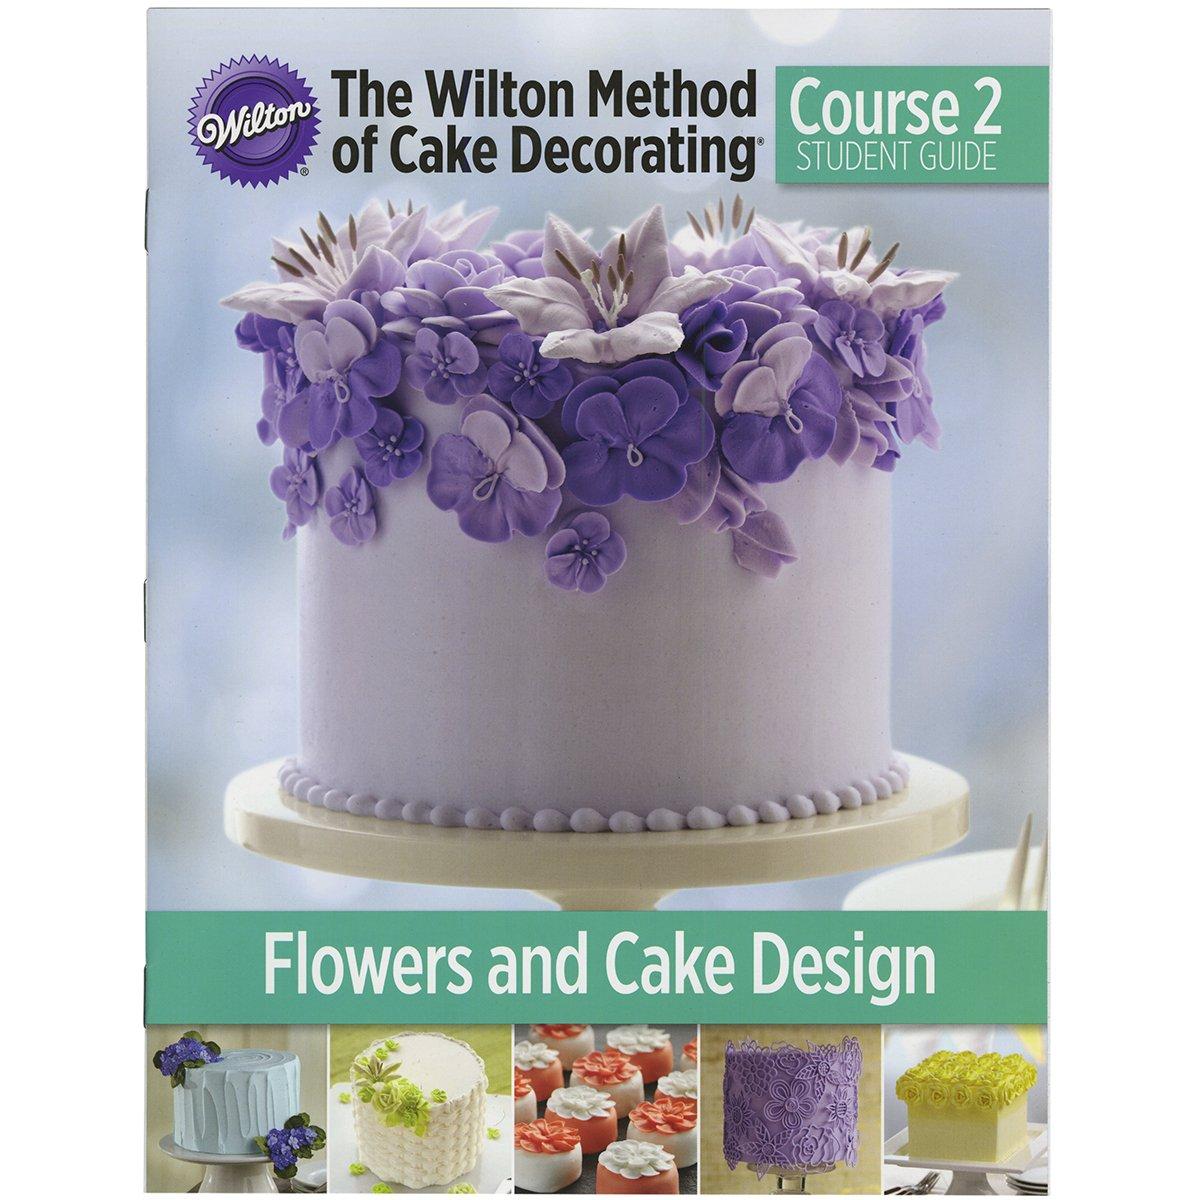 amazoncom the wilton method of cake decorating course 2 student - Cake Decorating Classes Near Me